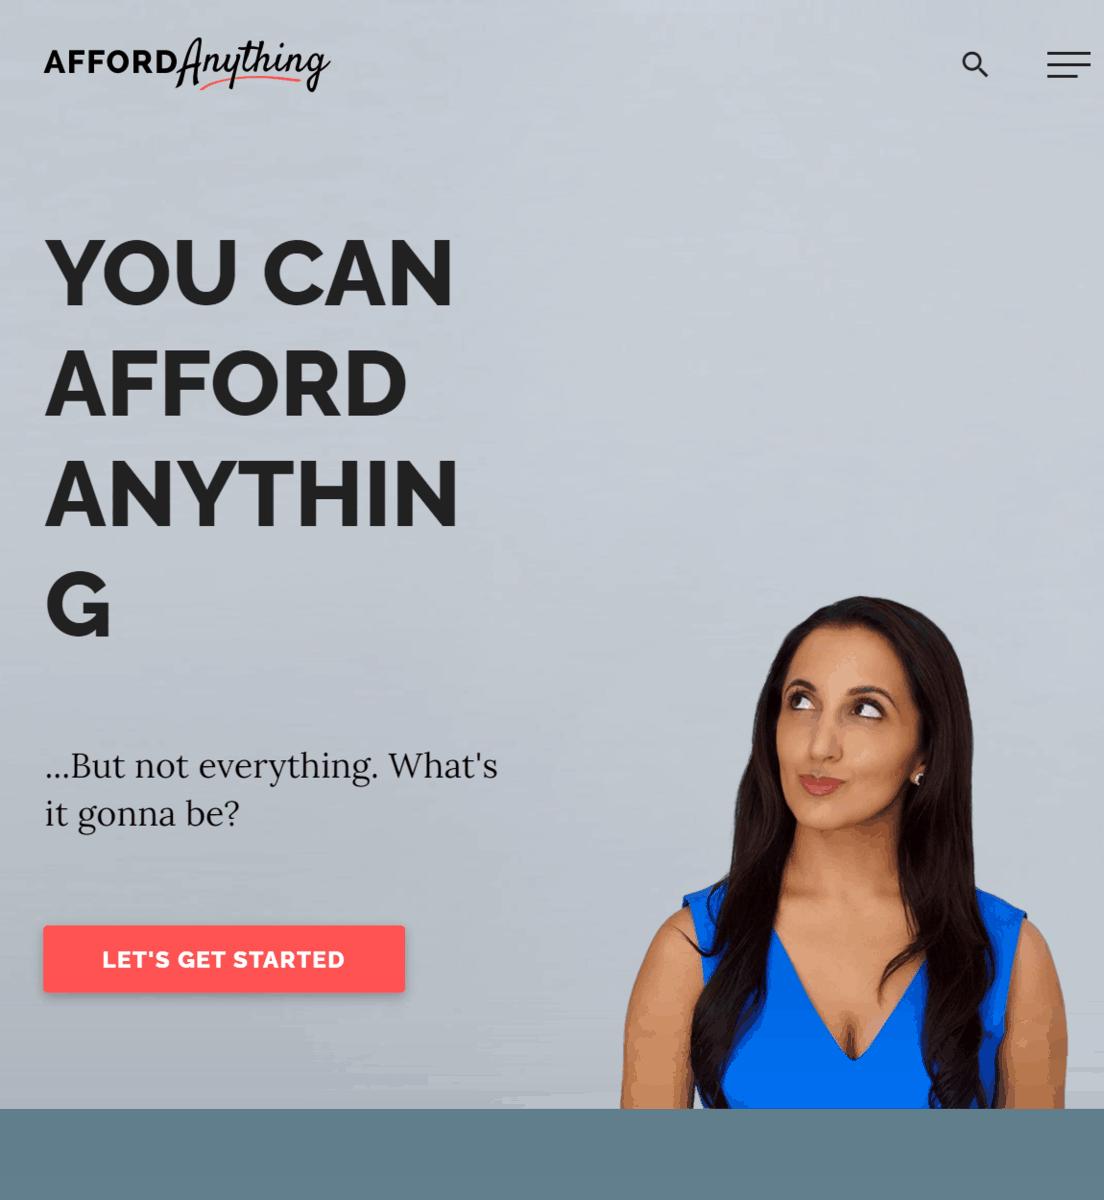 Afford Anything